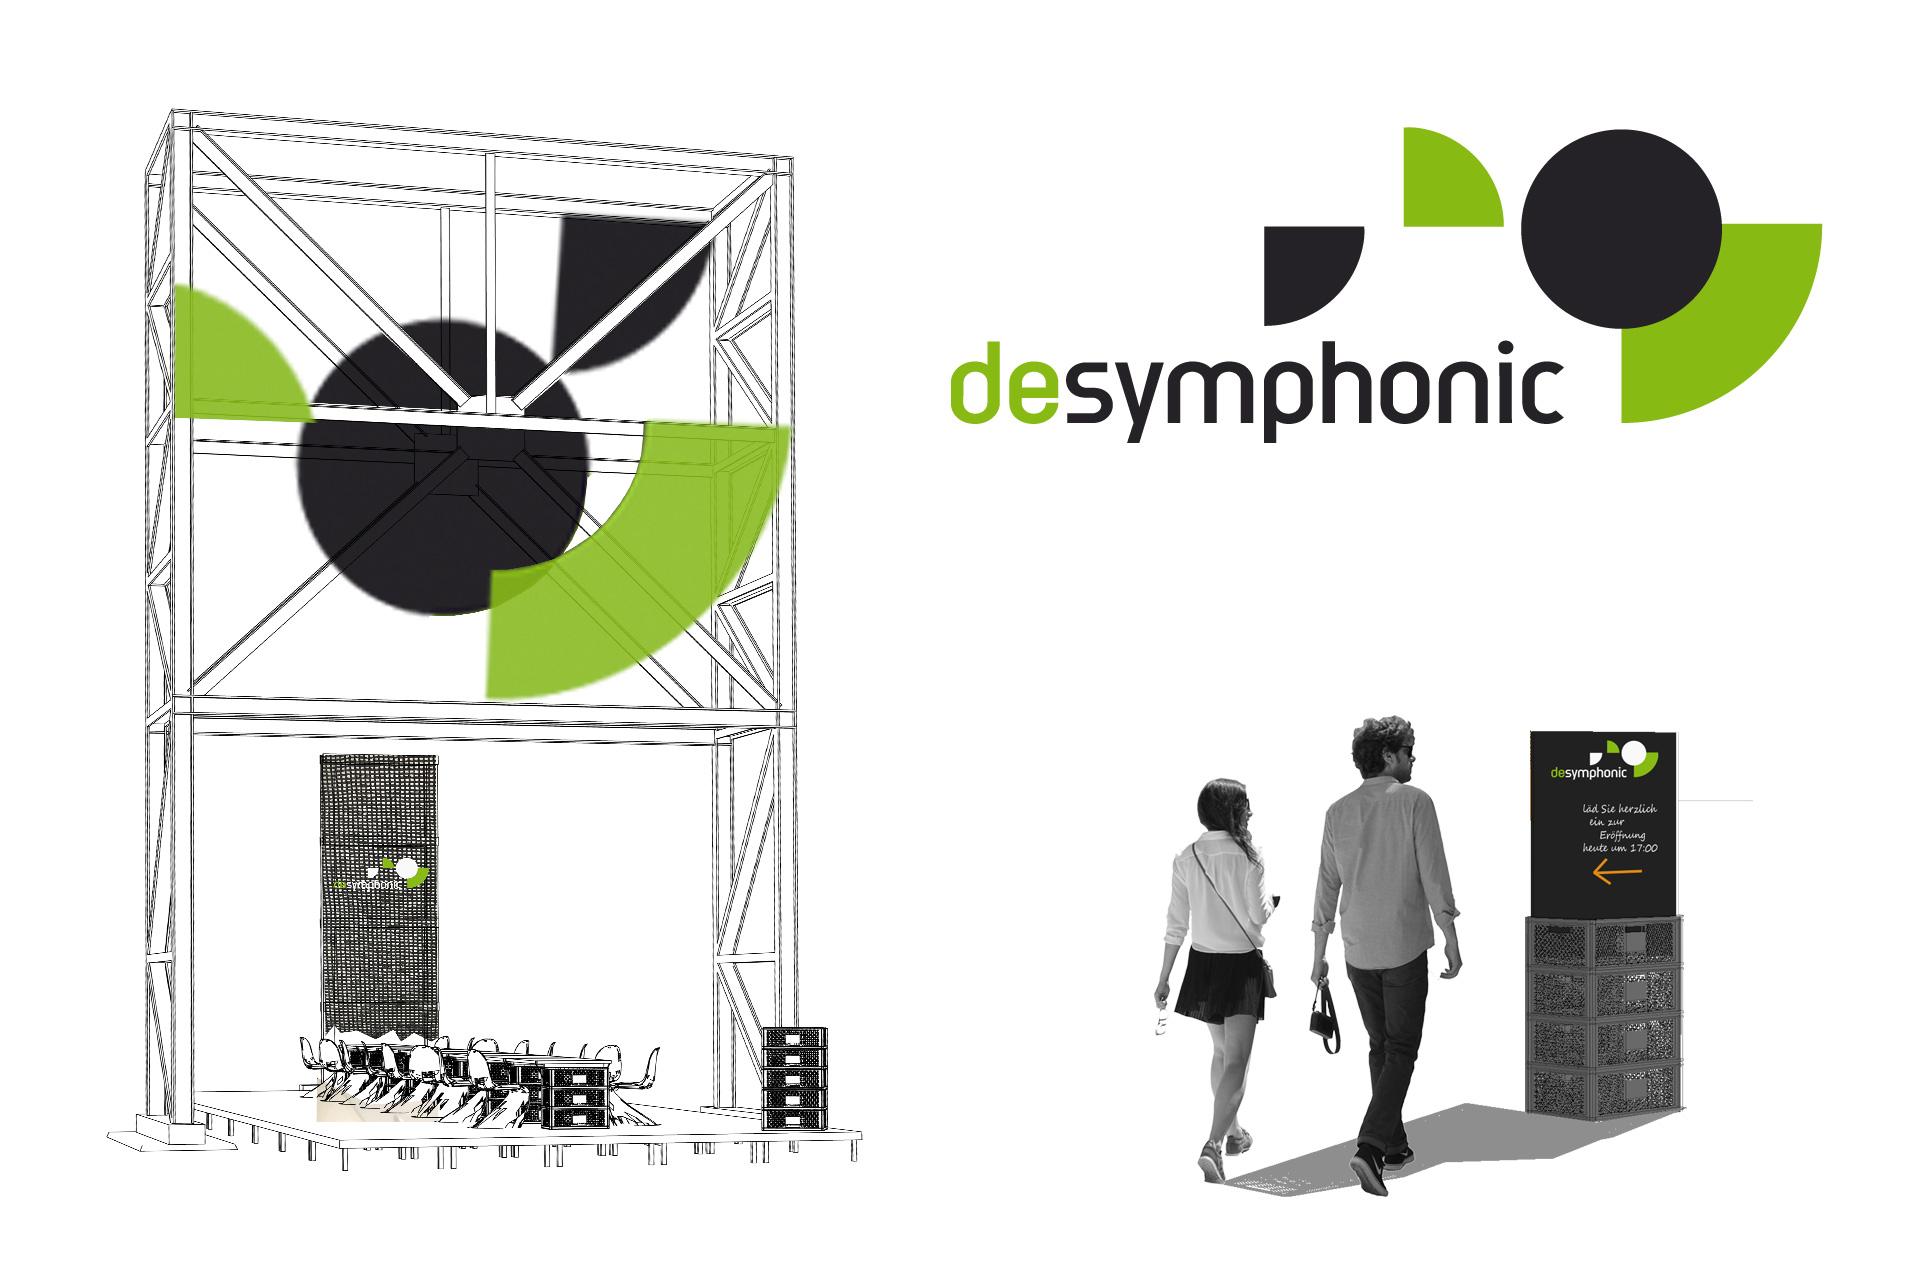 desymphonic